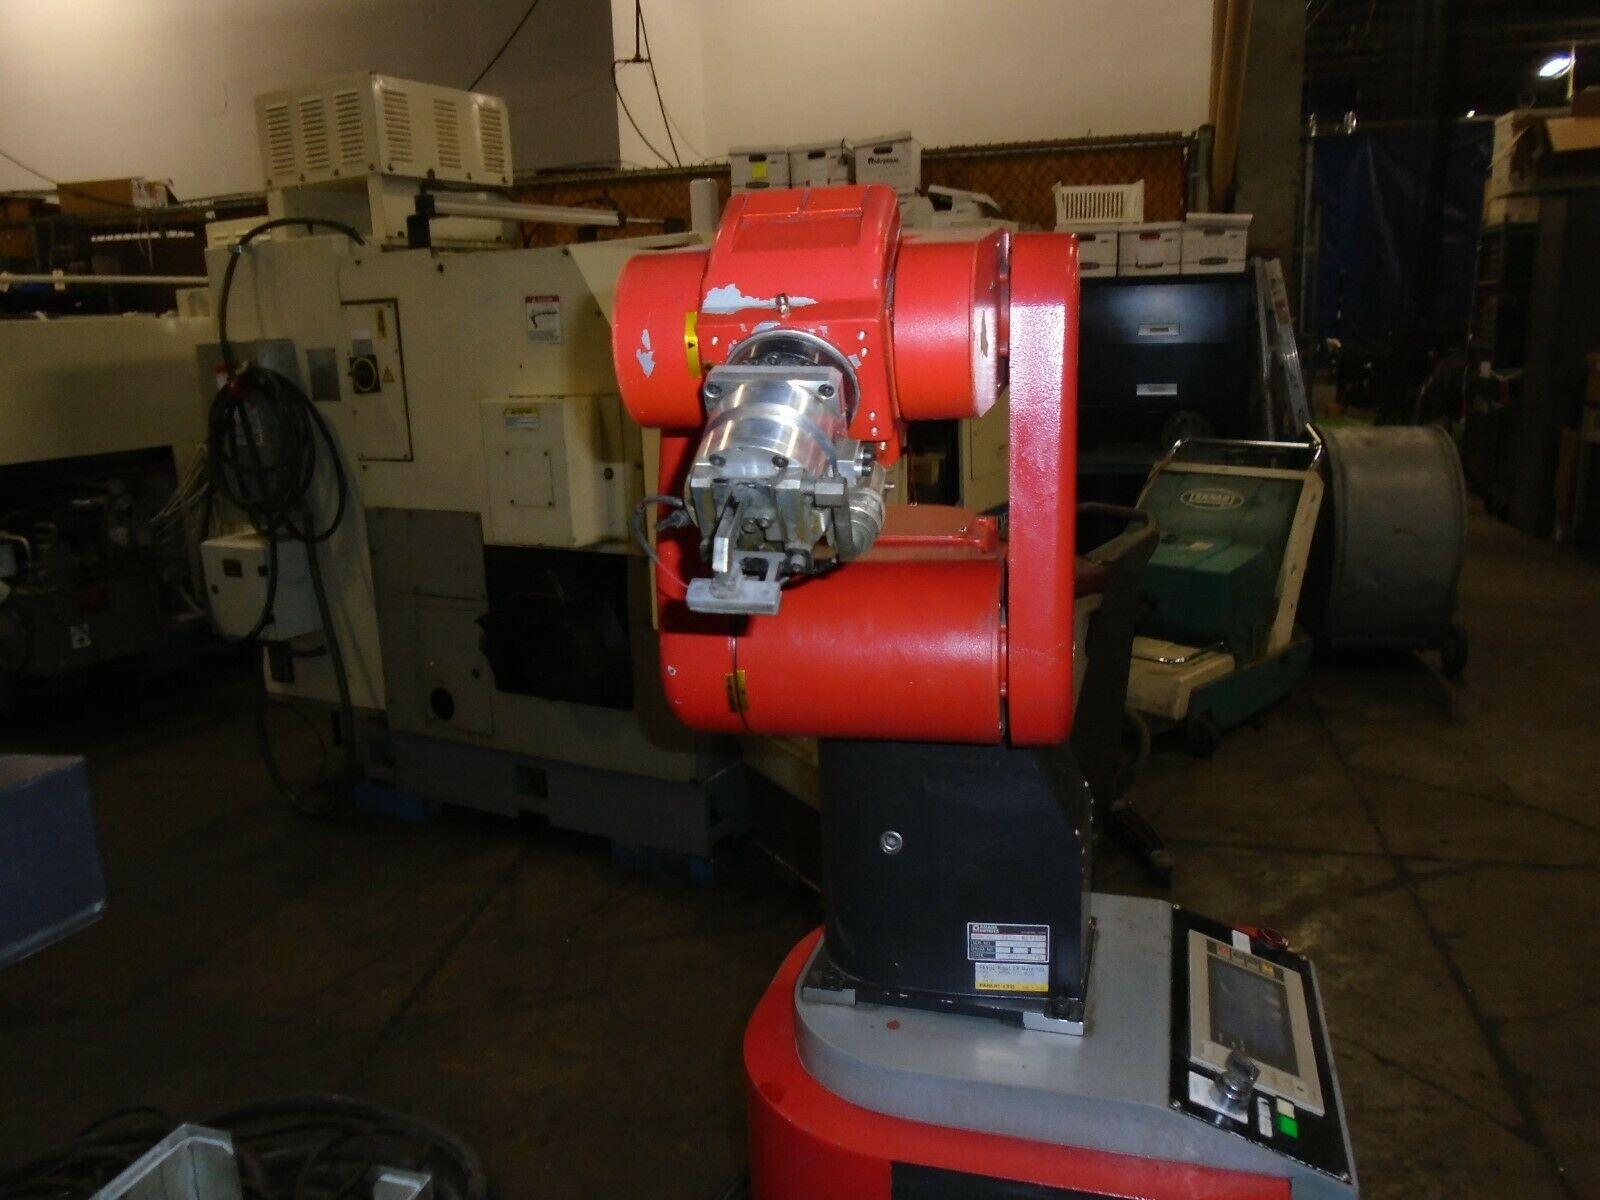 Fanuc Robot LR Mate 100 A5B-1131-8001 Mini Cel R-J2 Control - Image 3 of 12